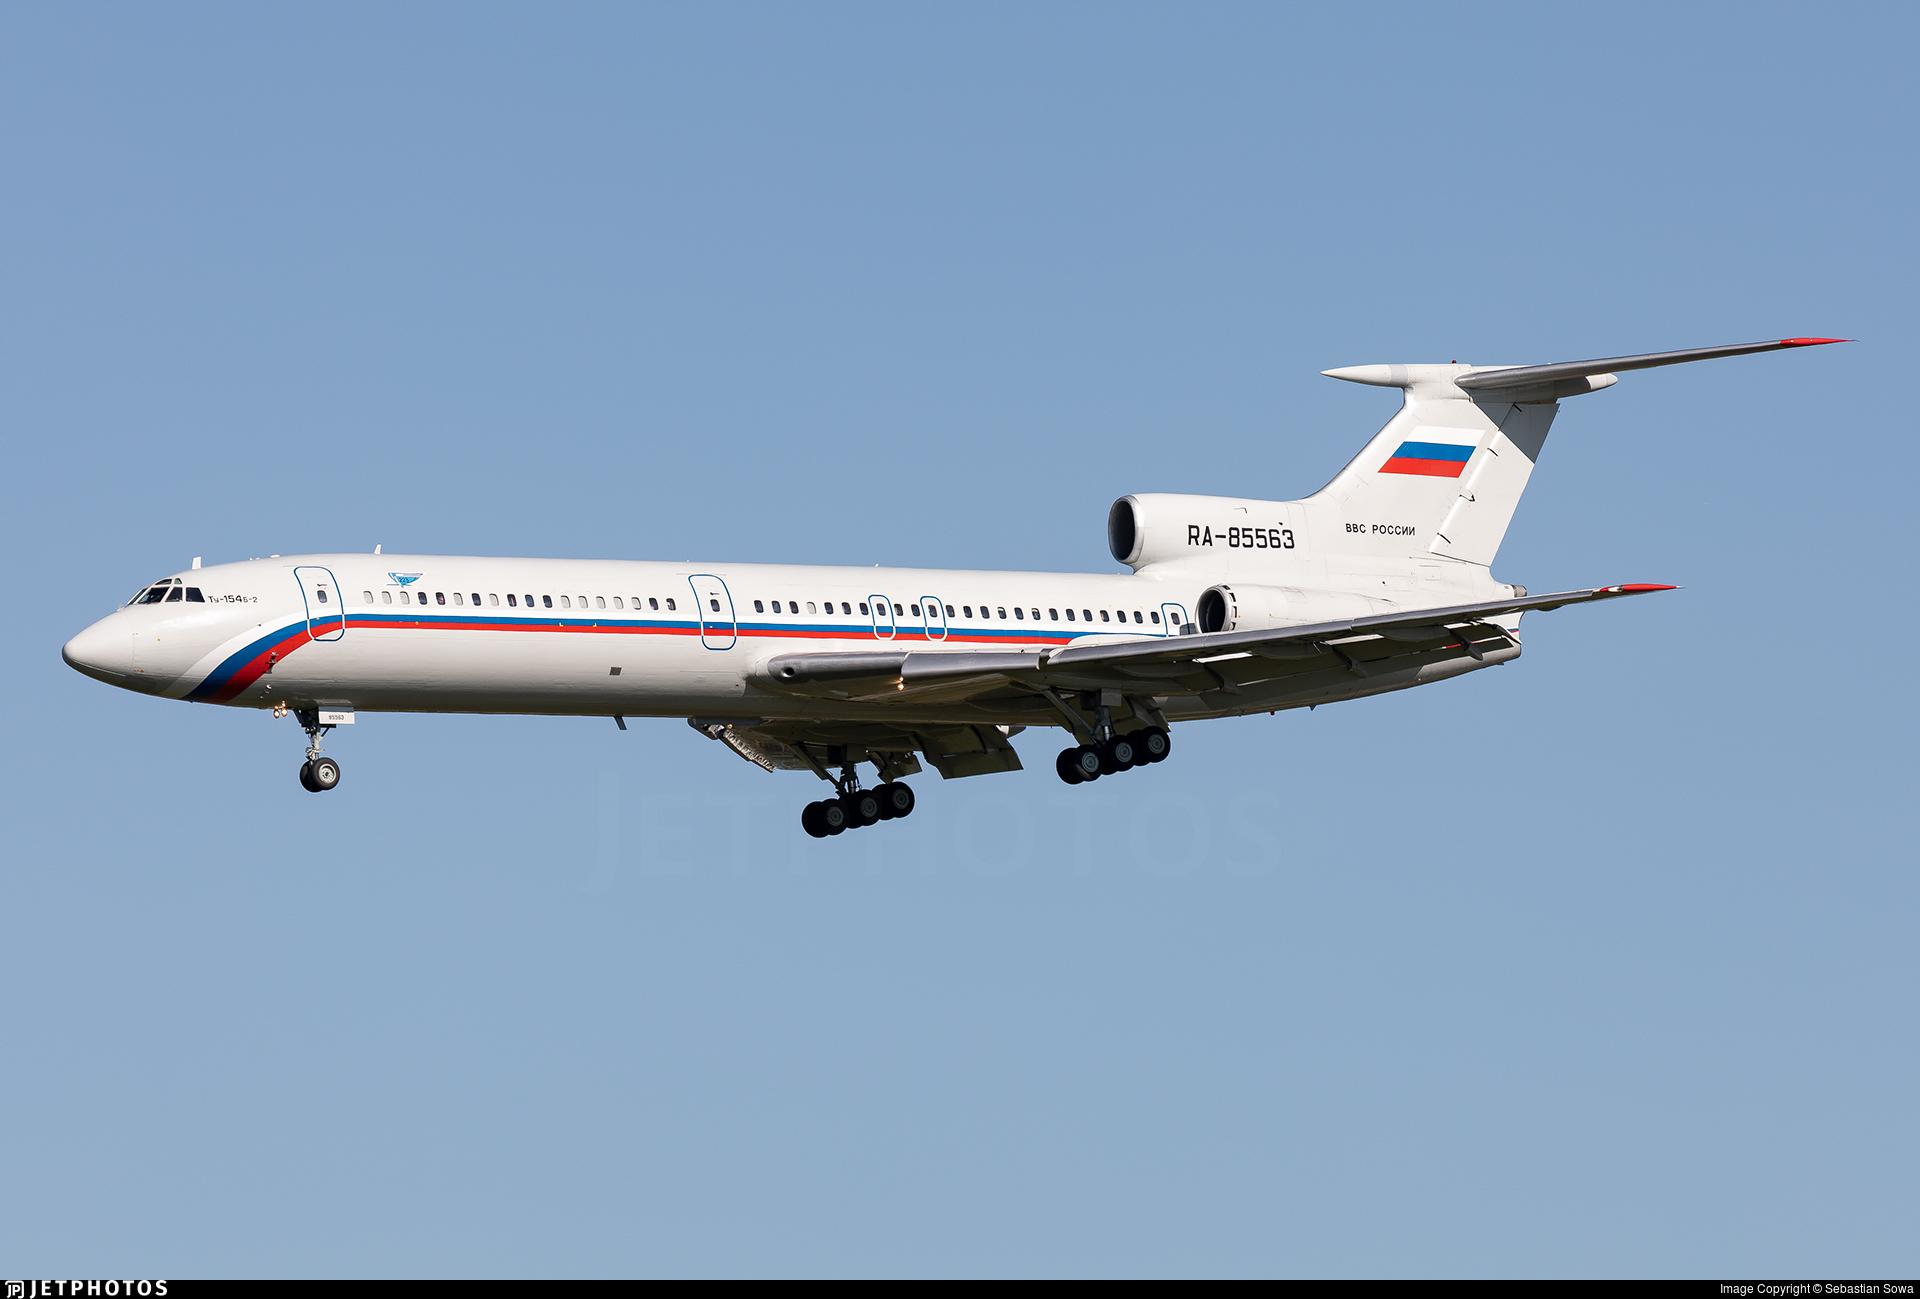 RA-85563 - Tupolev Tu-154B-2 - Russia - Air Force